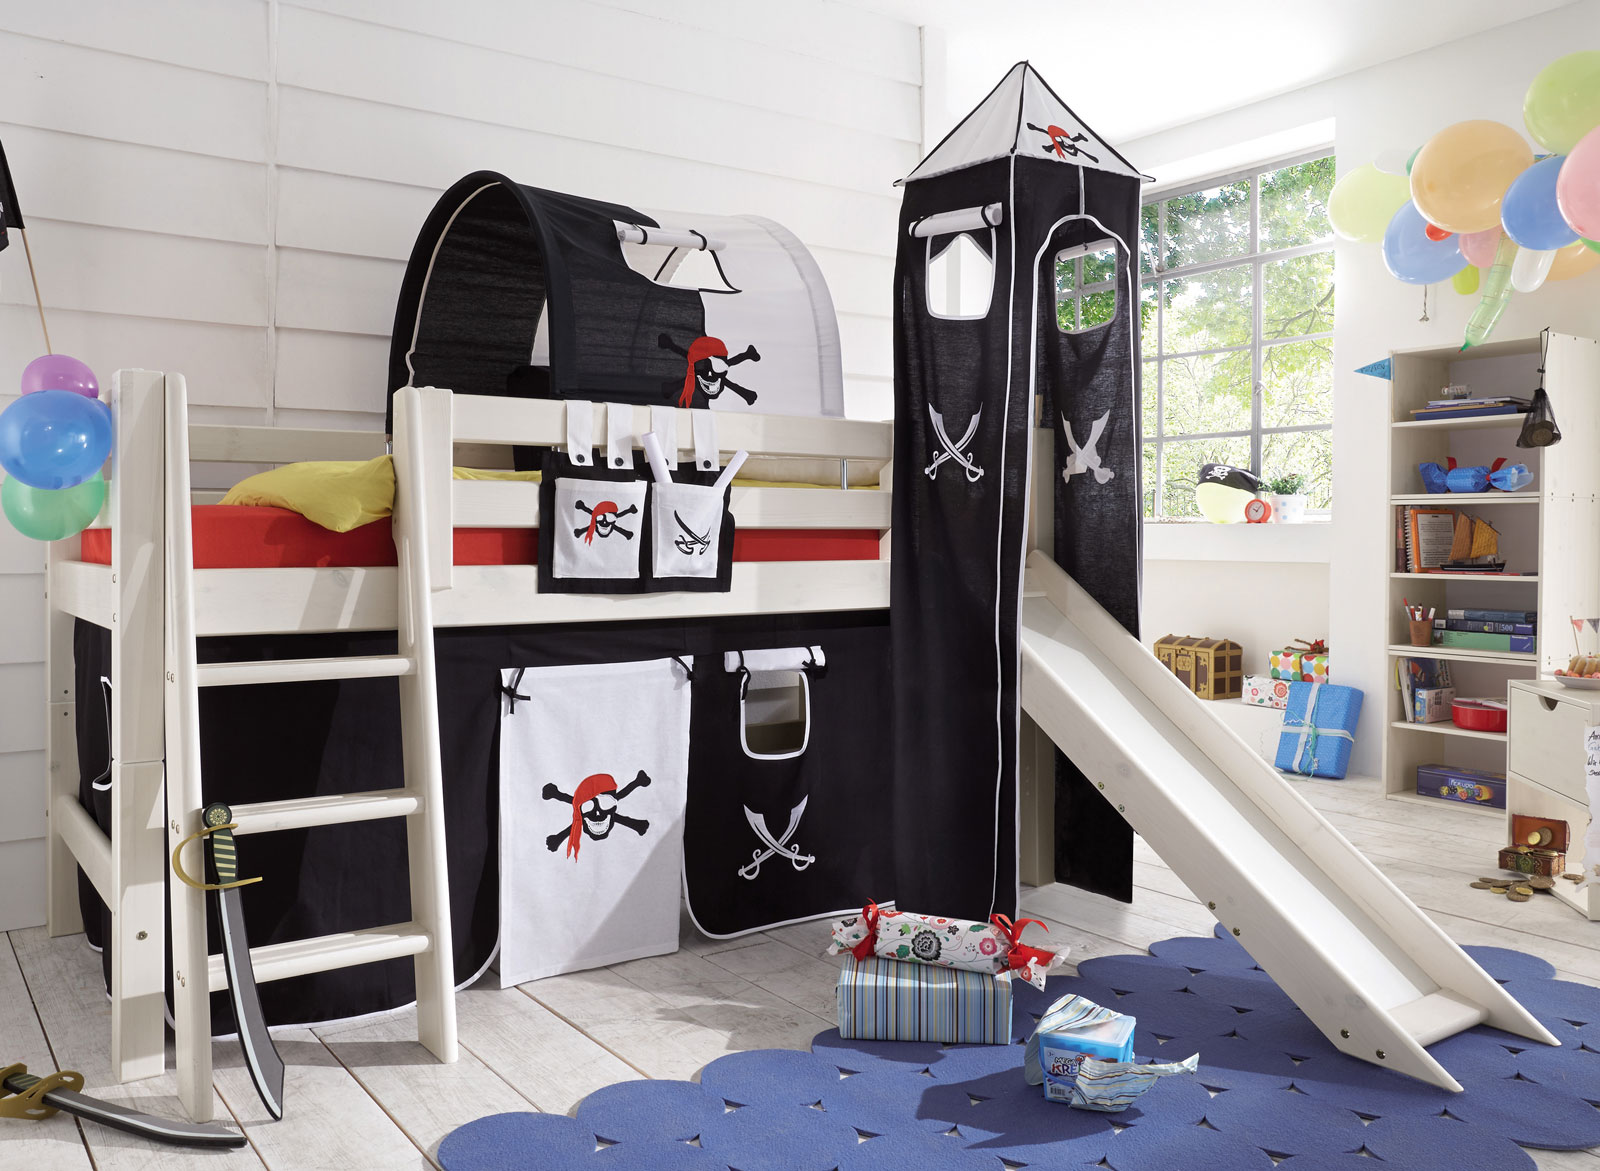 Piraten Mini-Hochbett mit Rutsche kaufen - Seeräuber   BETTEN.at